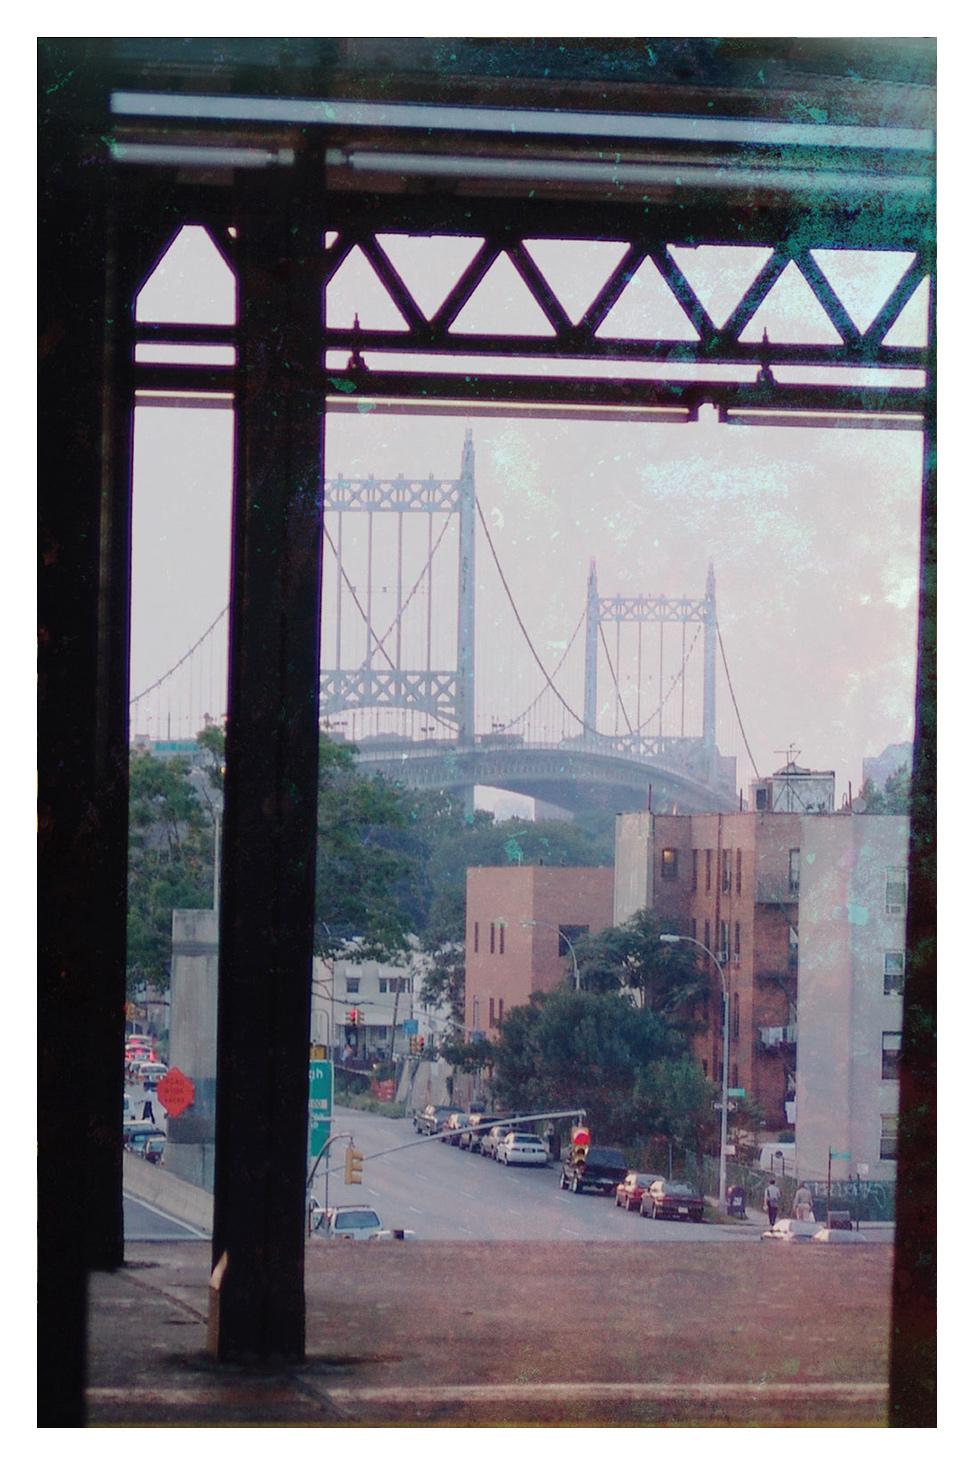 001_FuckOuttaHere_NYC-01.jpg